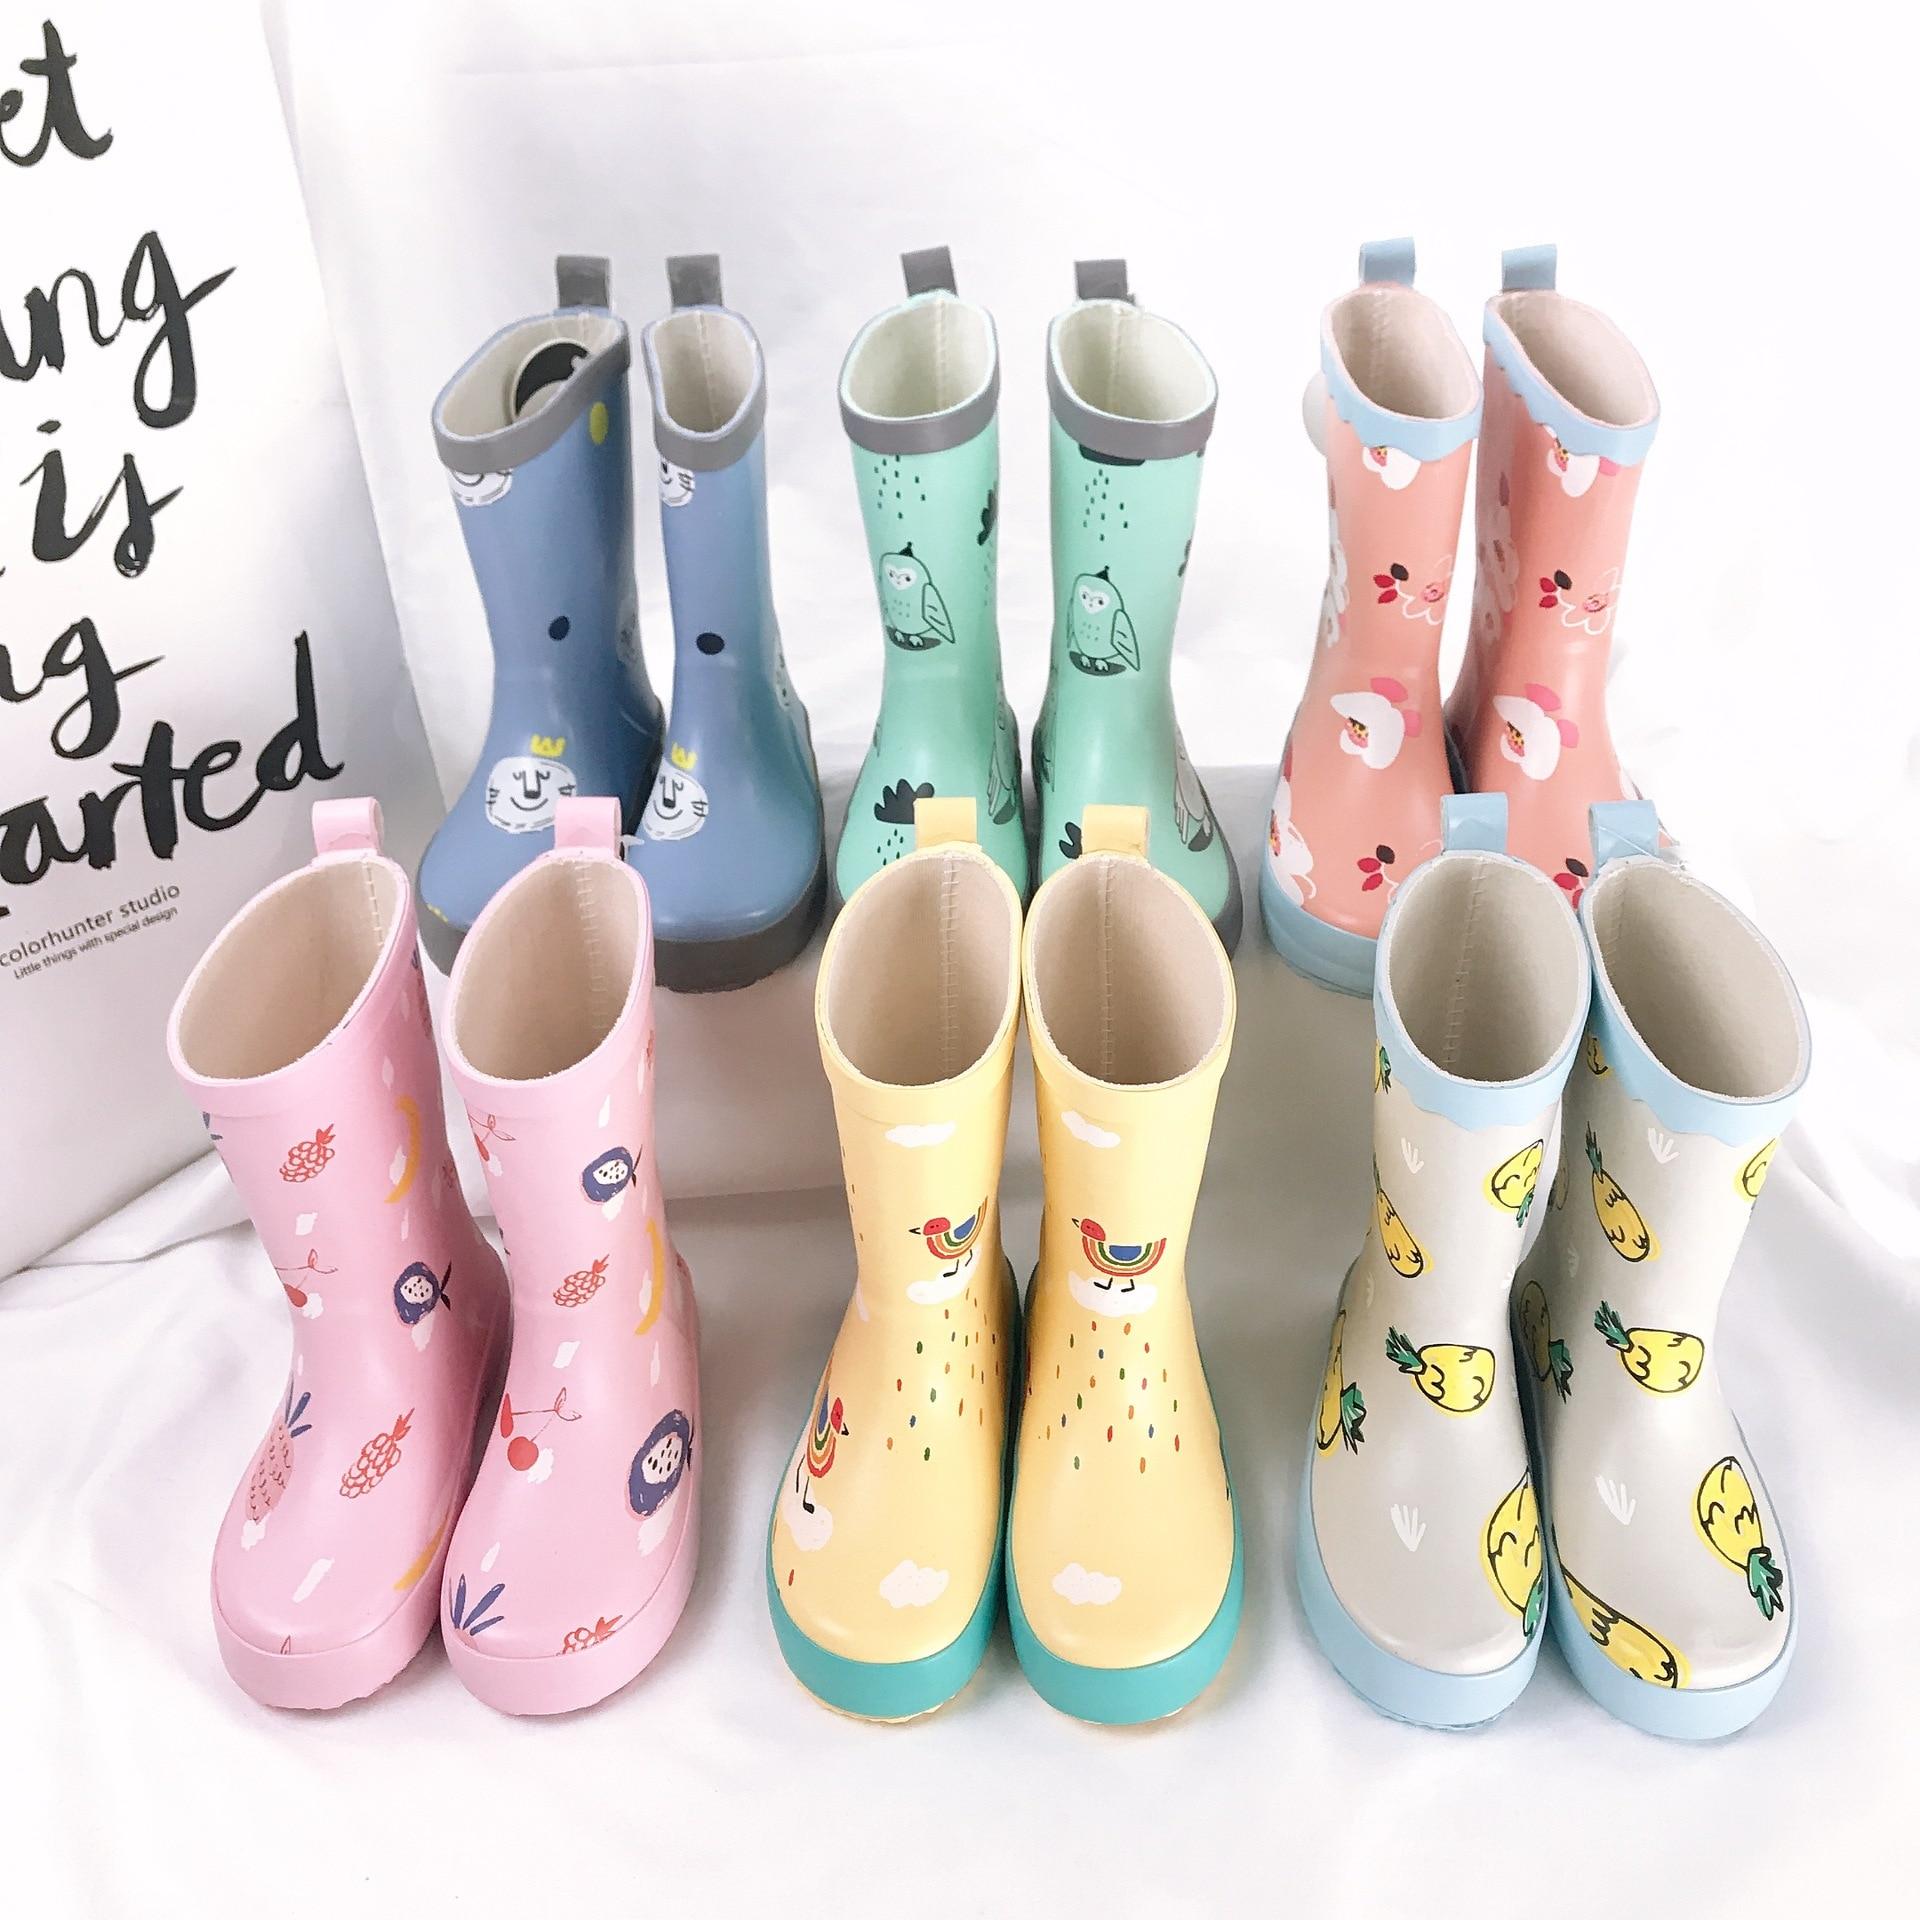 Rain shoes kids Girl Cute cartoon Printed Children's Rubber Boots Kalosze Dla Dzieci Waterproof Baby Water Shoes